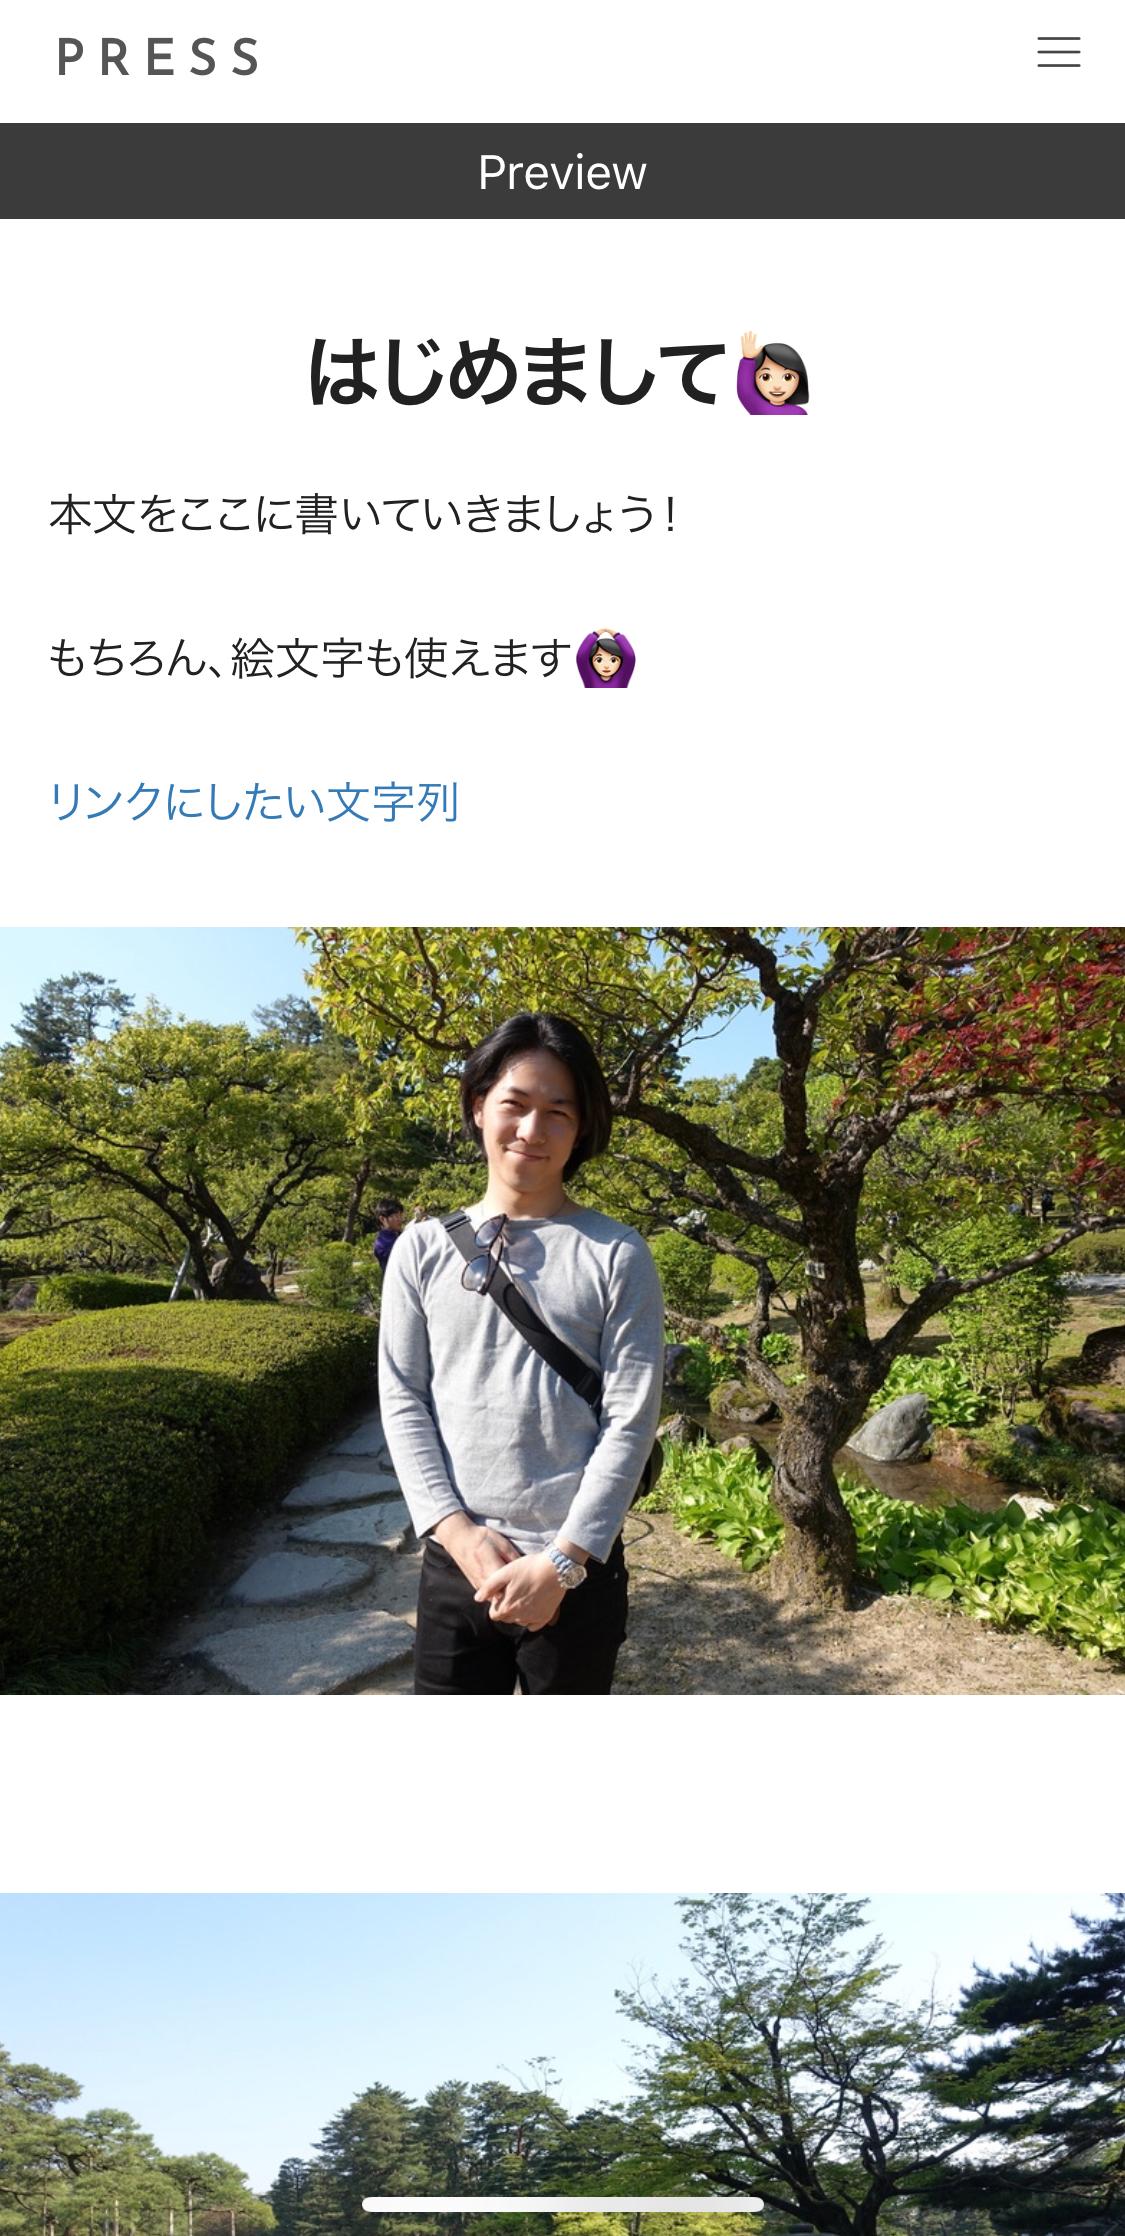 IMG_0128.jpg (1.8 MB)